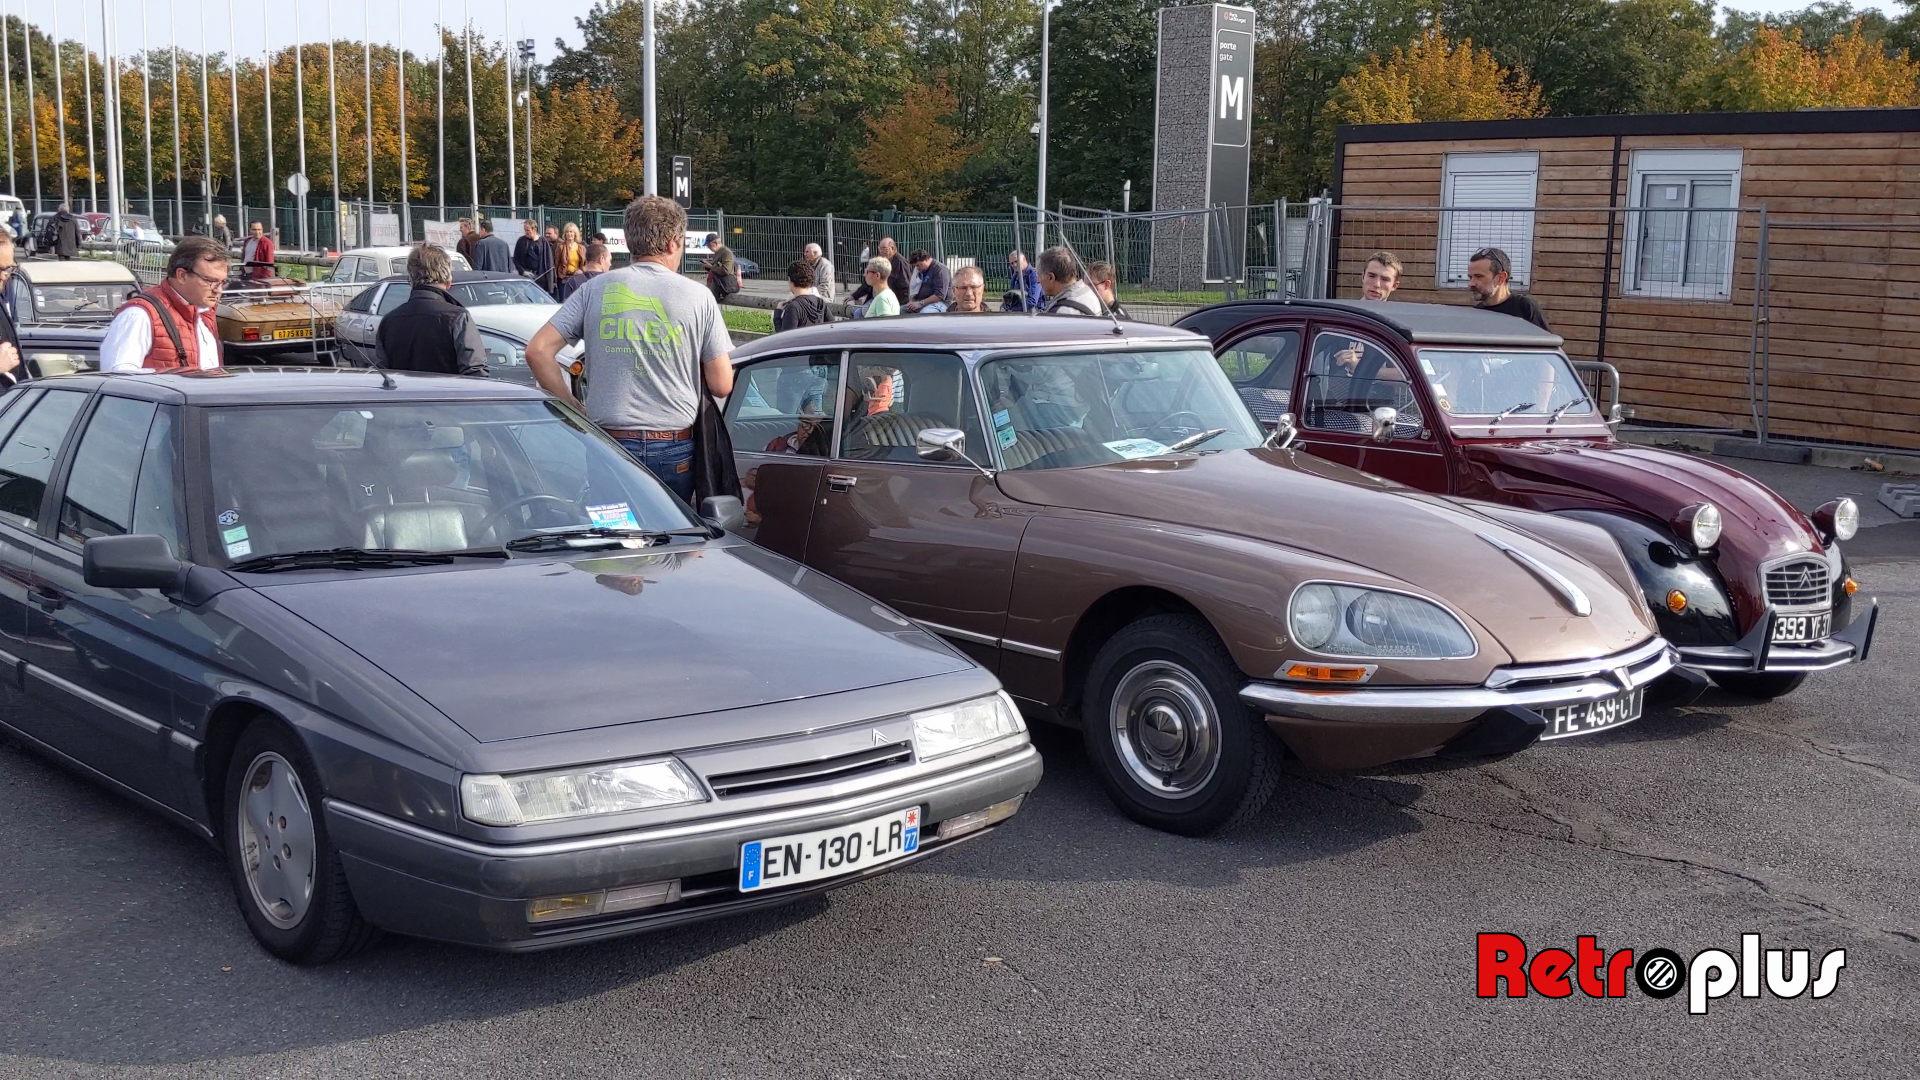 Automedon2019-parkingCitroen14